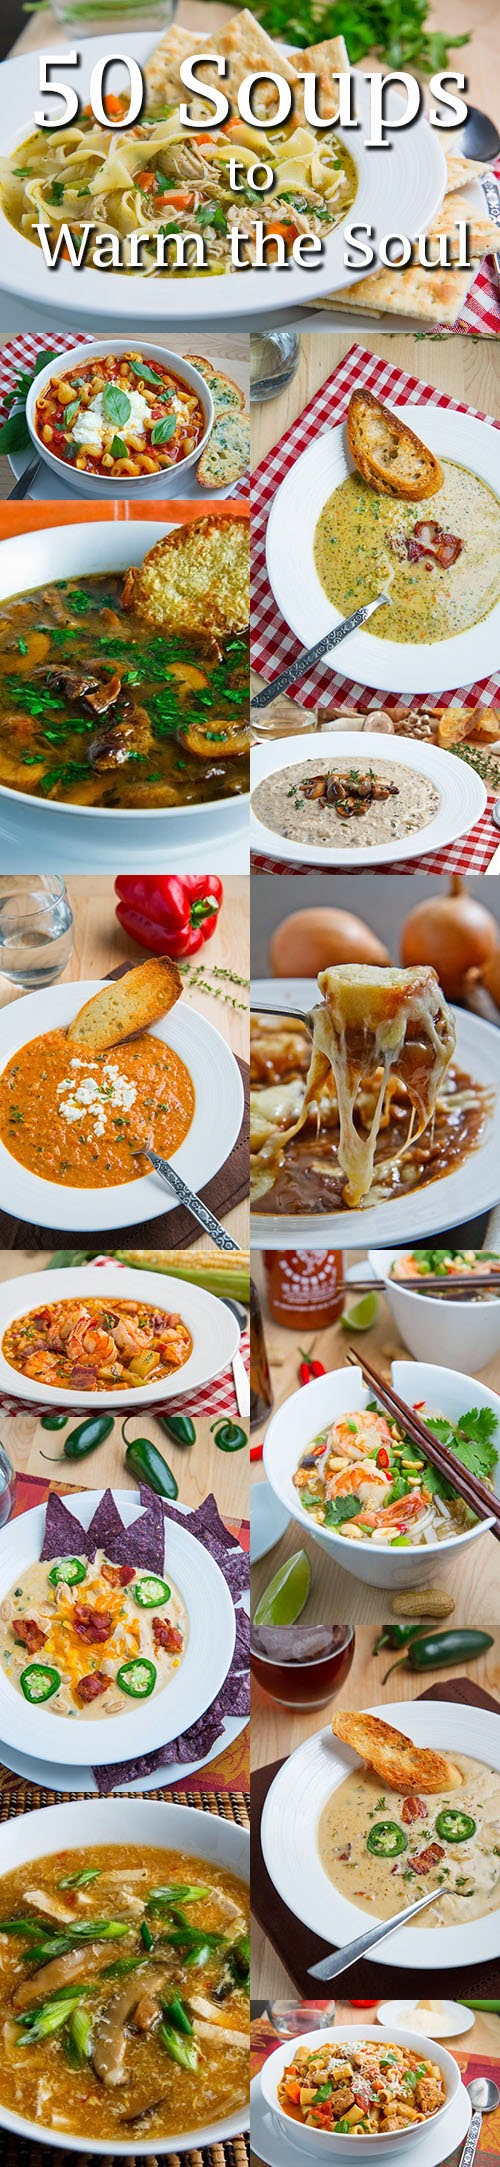 60 Soups to Warm the Soul  Recetas para cocinar